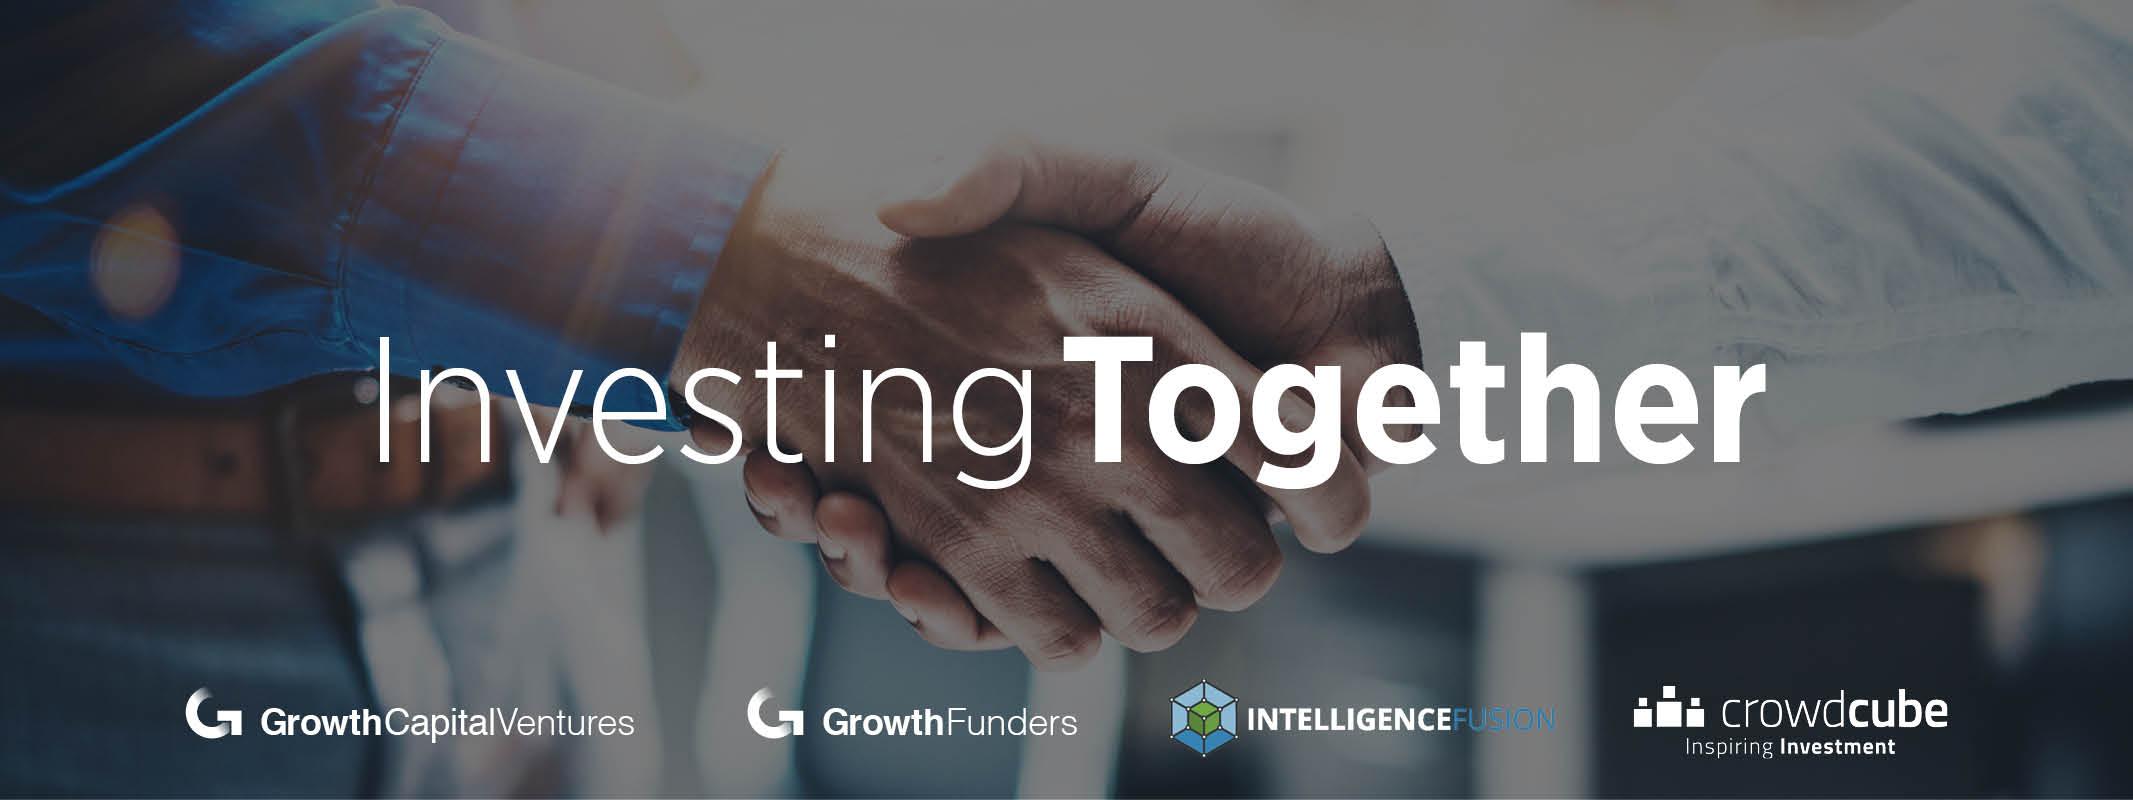 Intelligence-Fusion-Crowdcube-Header.jpg